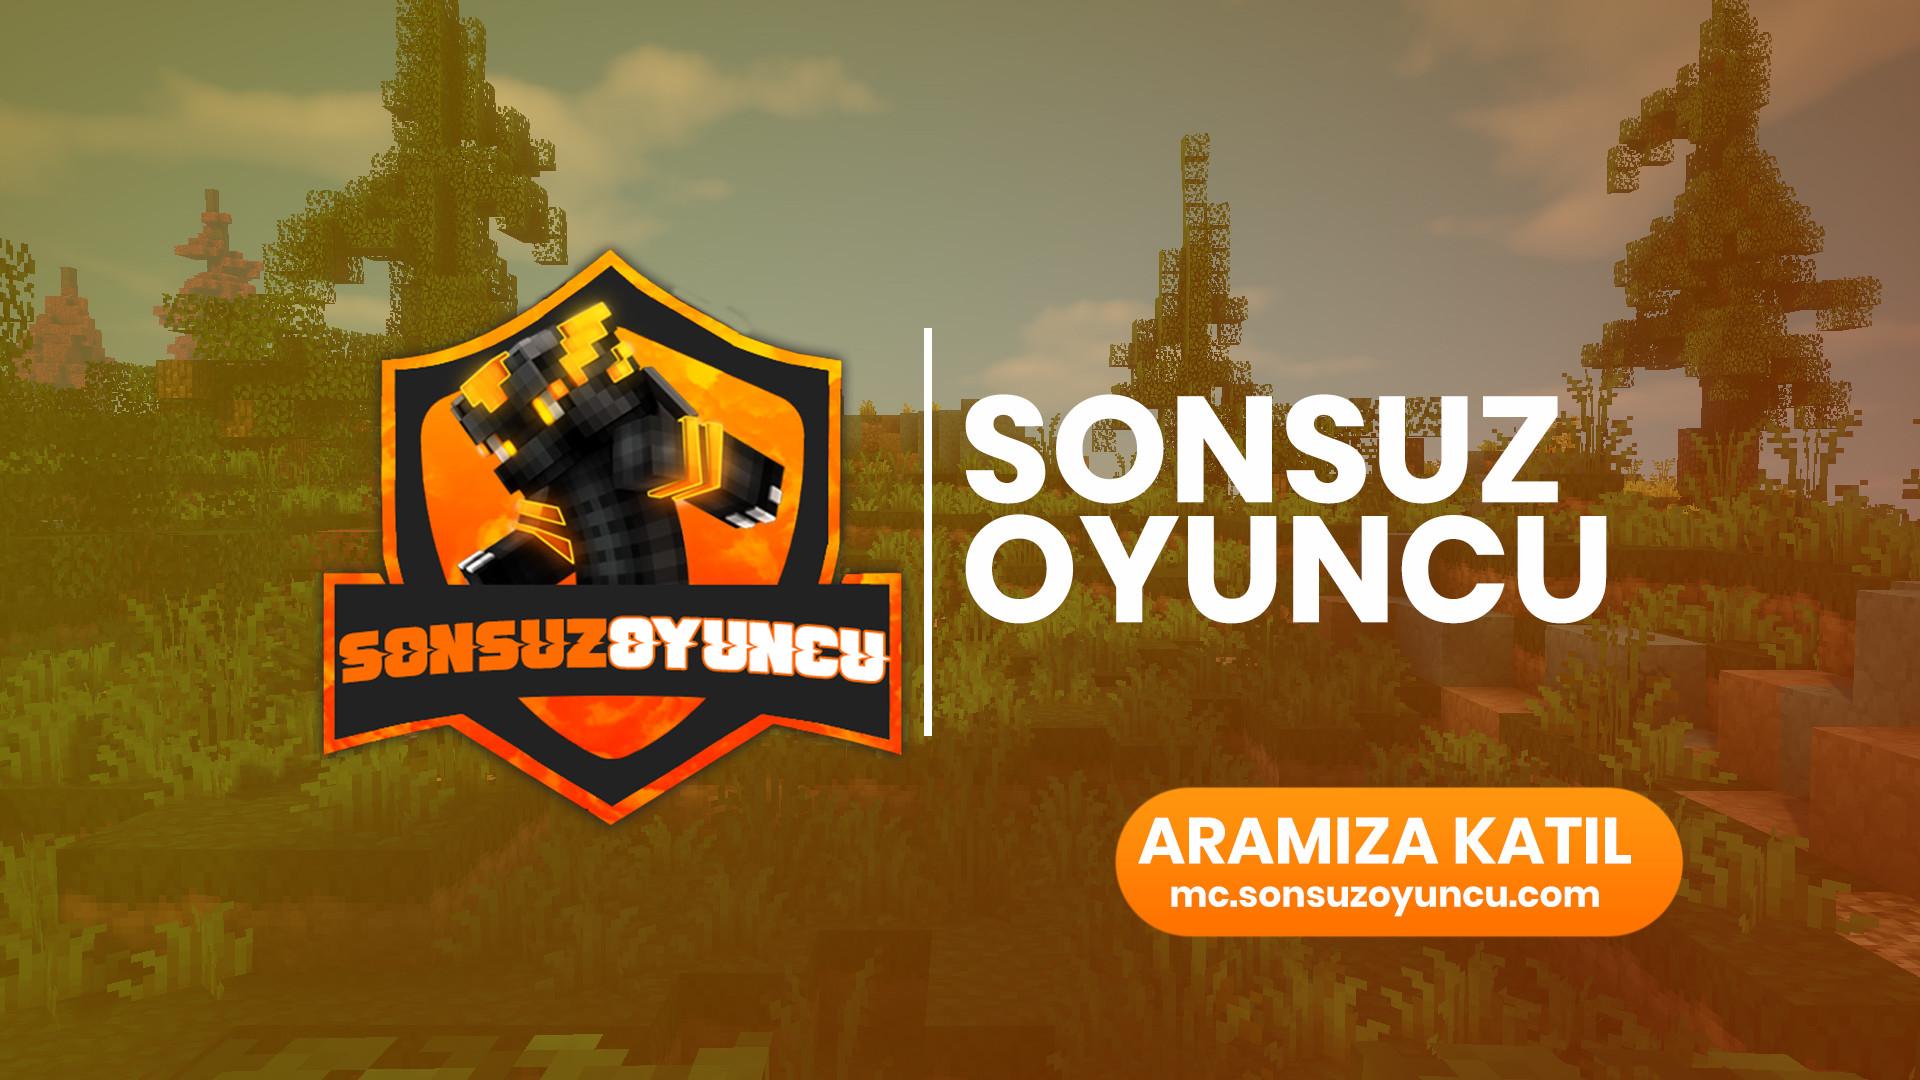 SonsuzOyuncu Network!